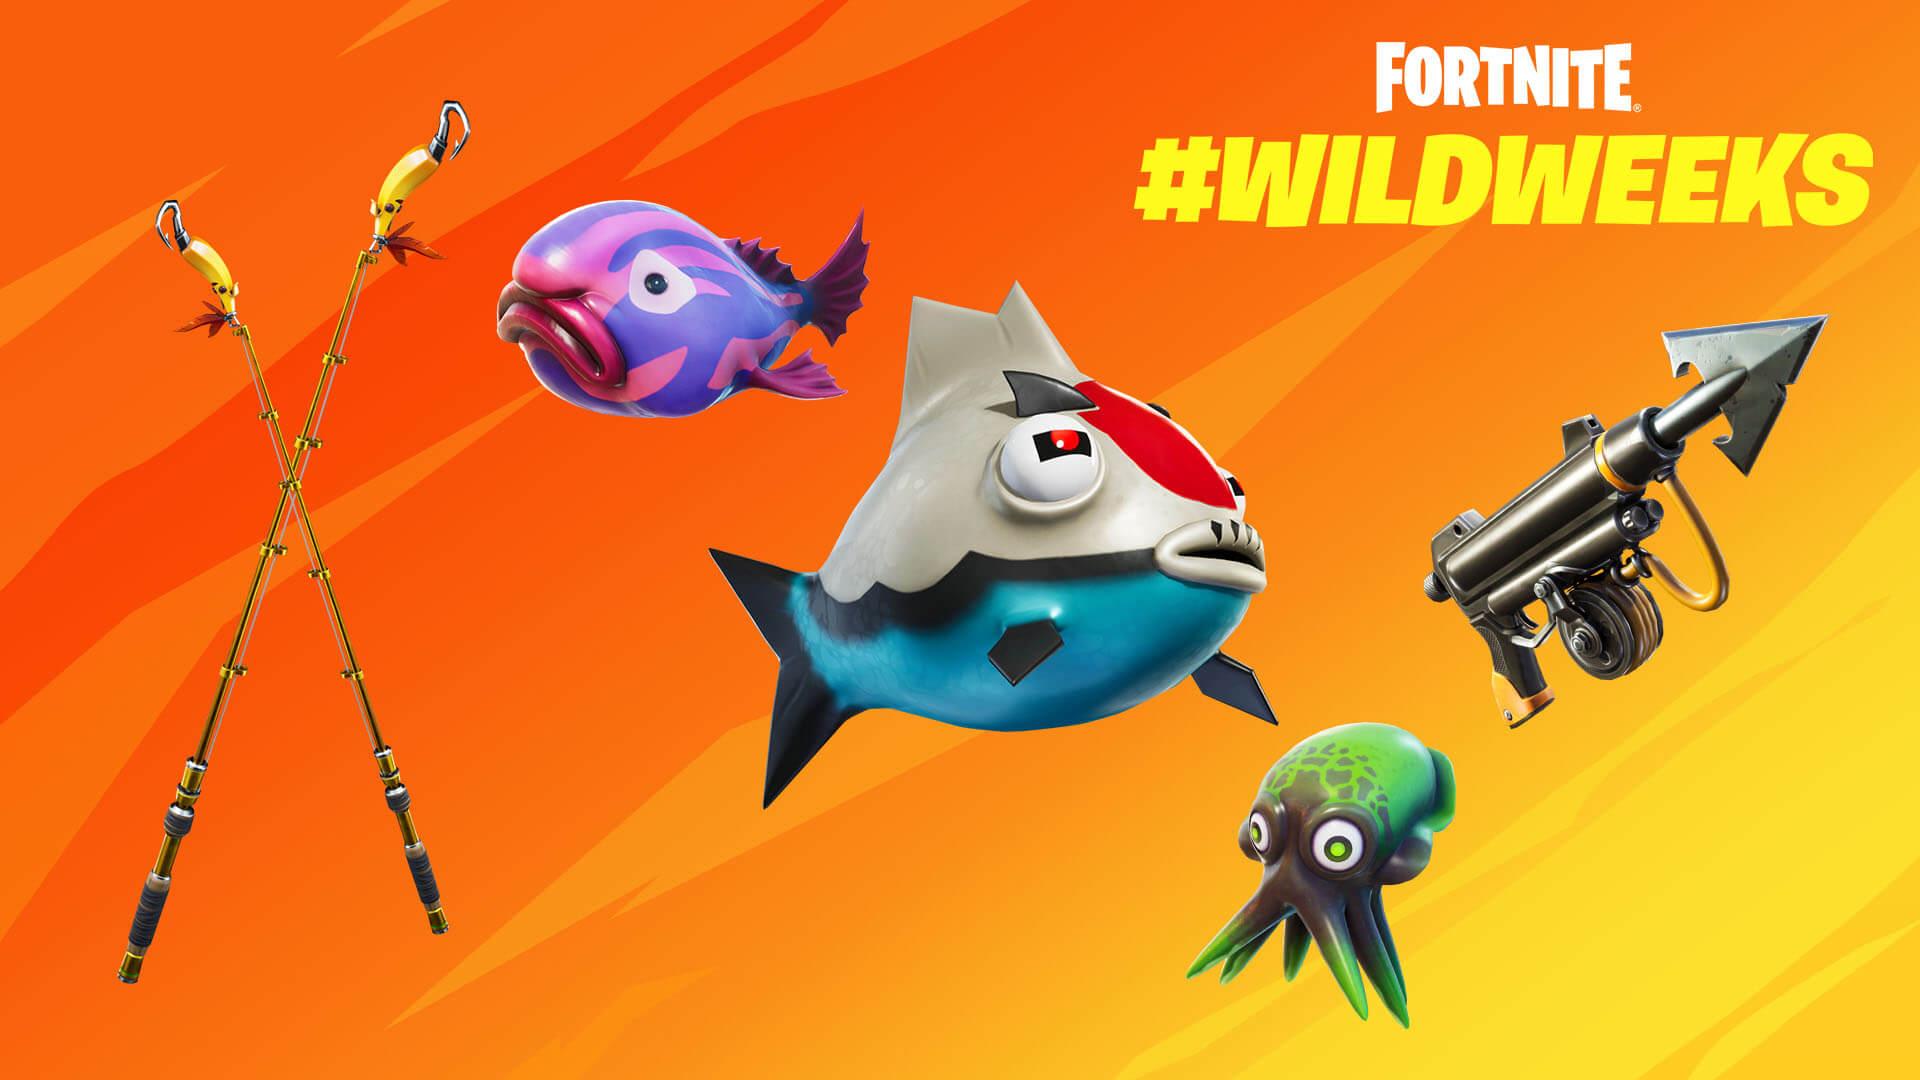 Fortnite Fish Fiesta